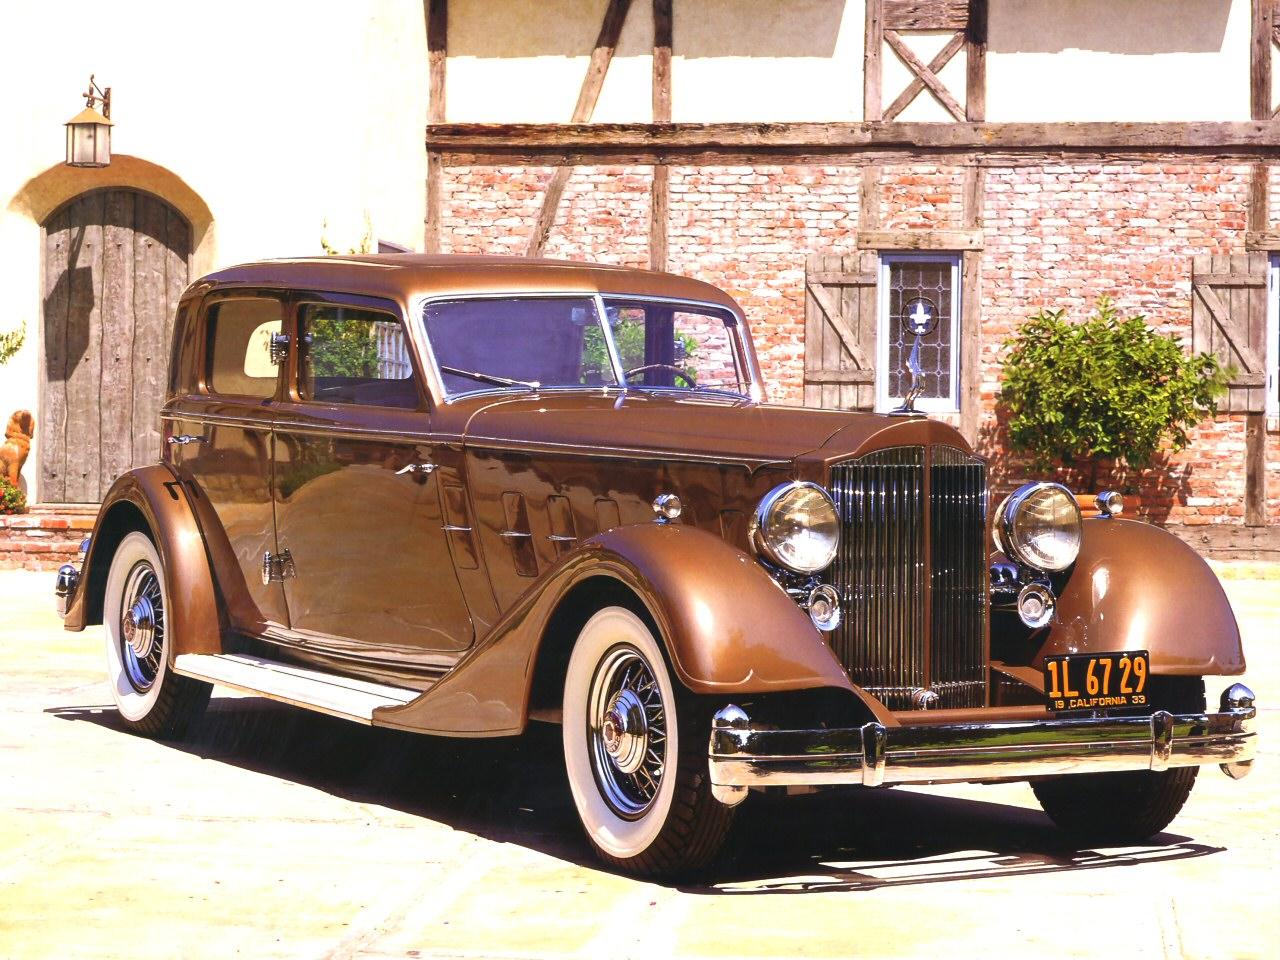 1933 Packard Twelve 3182 Deitrich V Windshield Special Sport Sedan Car Of The Dome Bronze Fvr